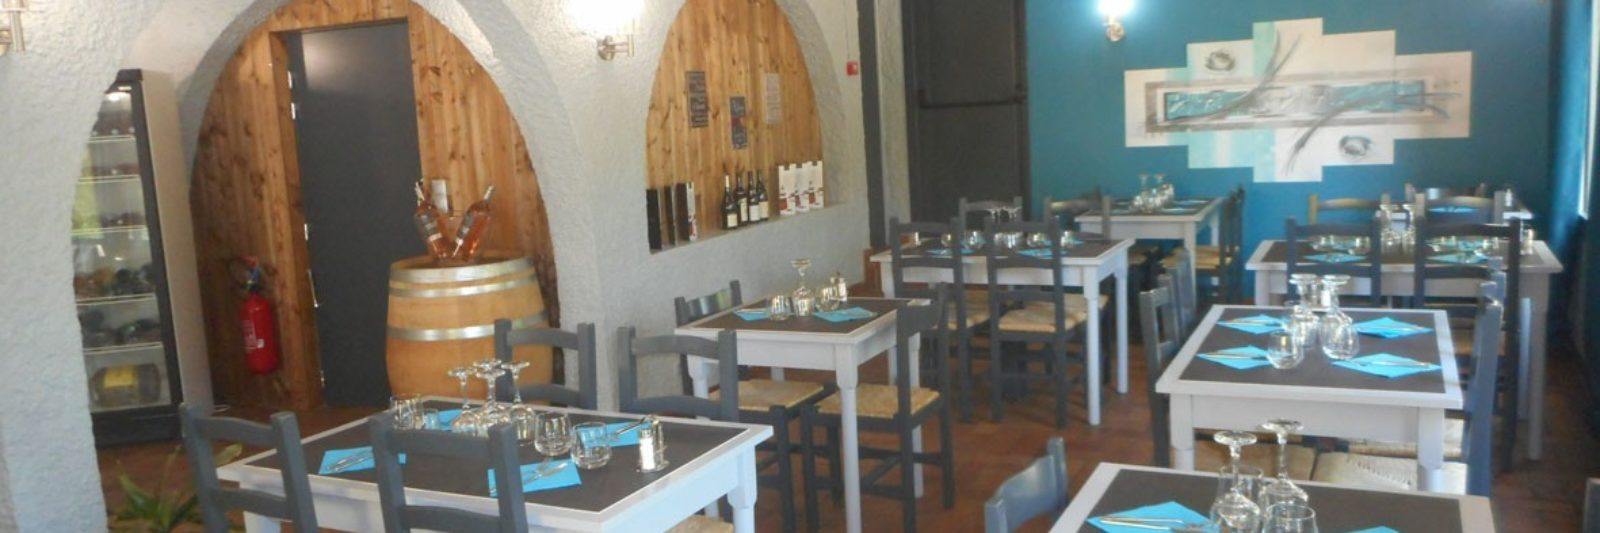 Restaurant crêperie à Vogüé en Ardèche